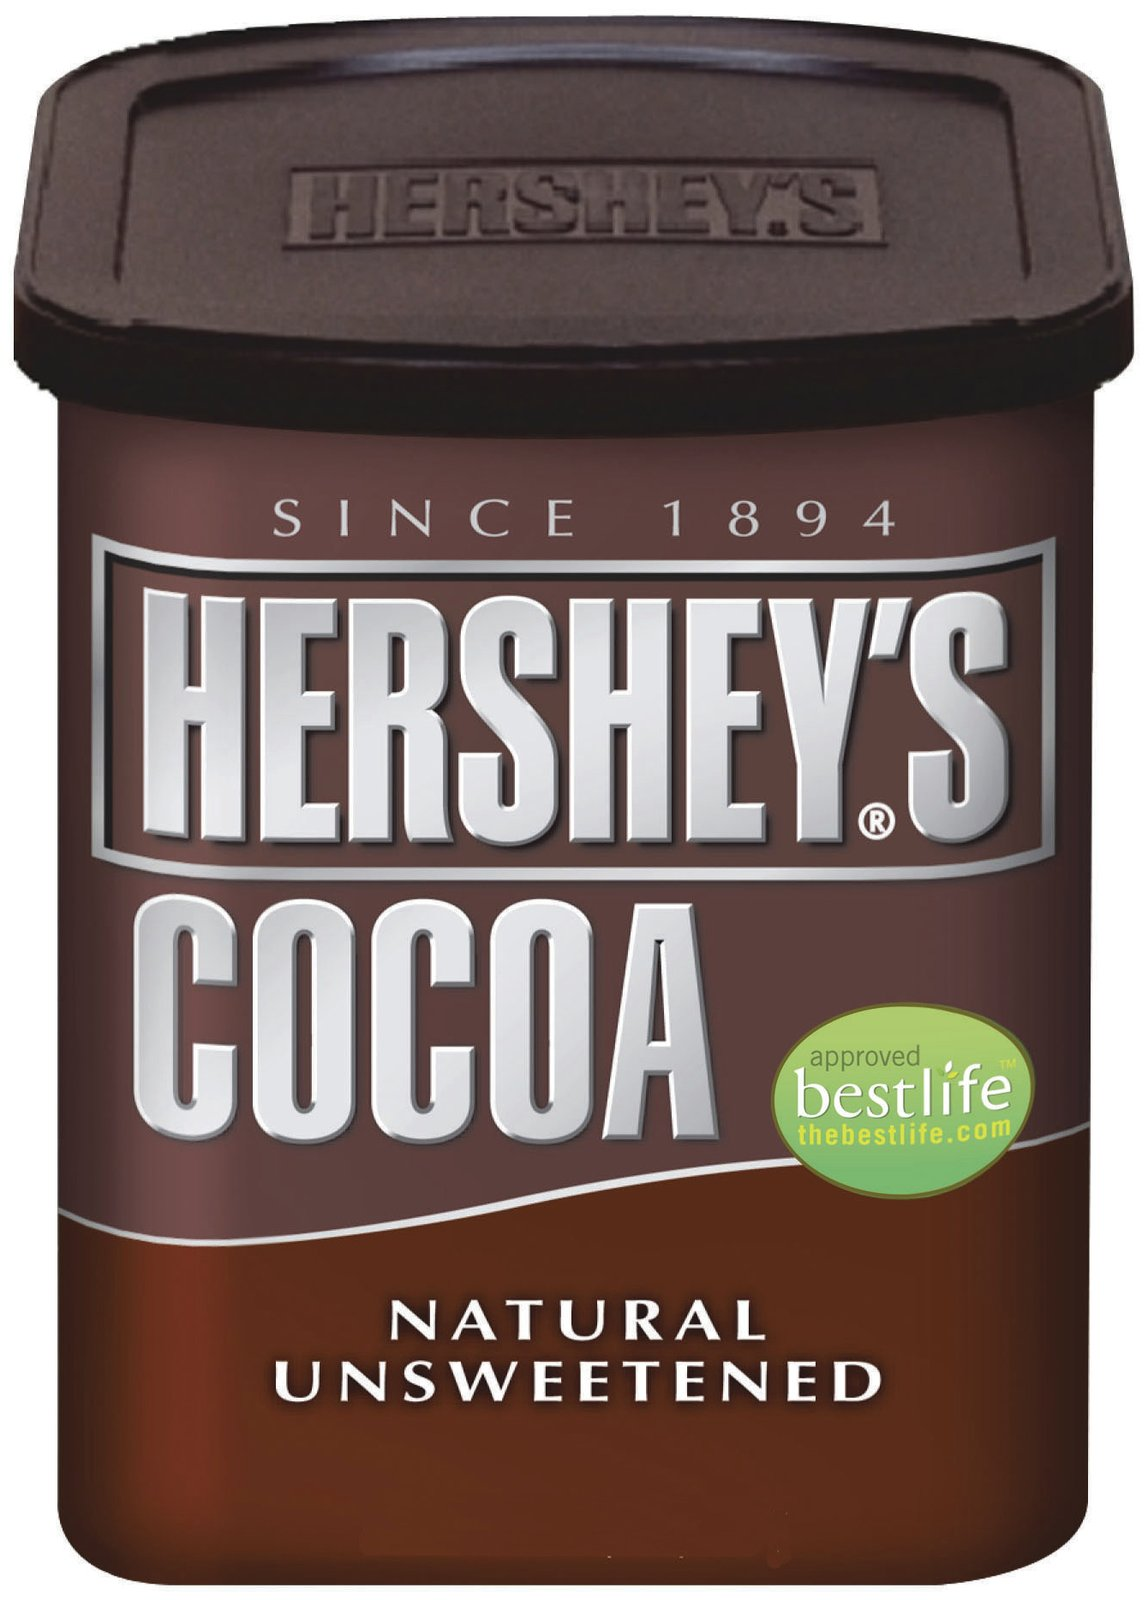 Hersheys Hot Cocoa